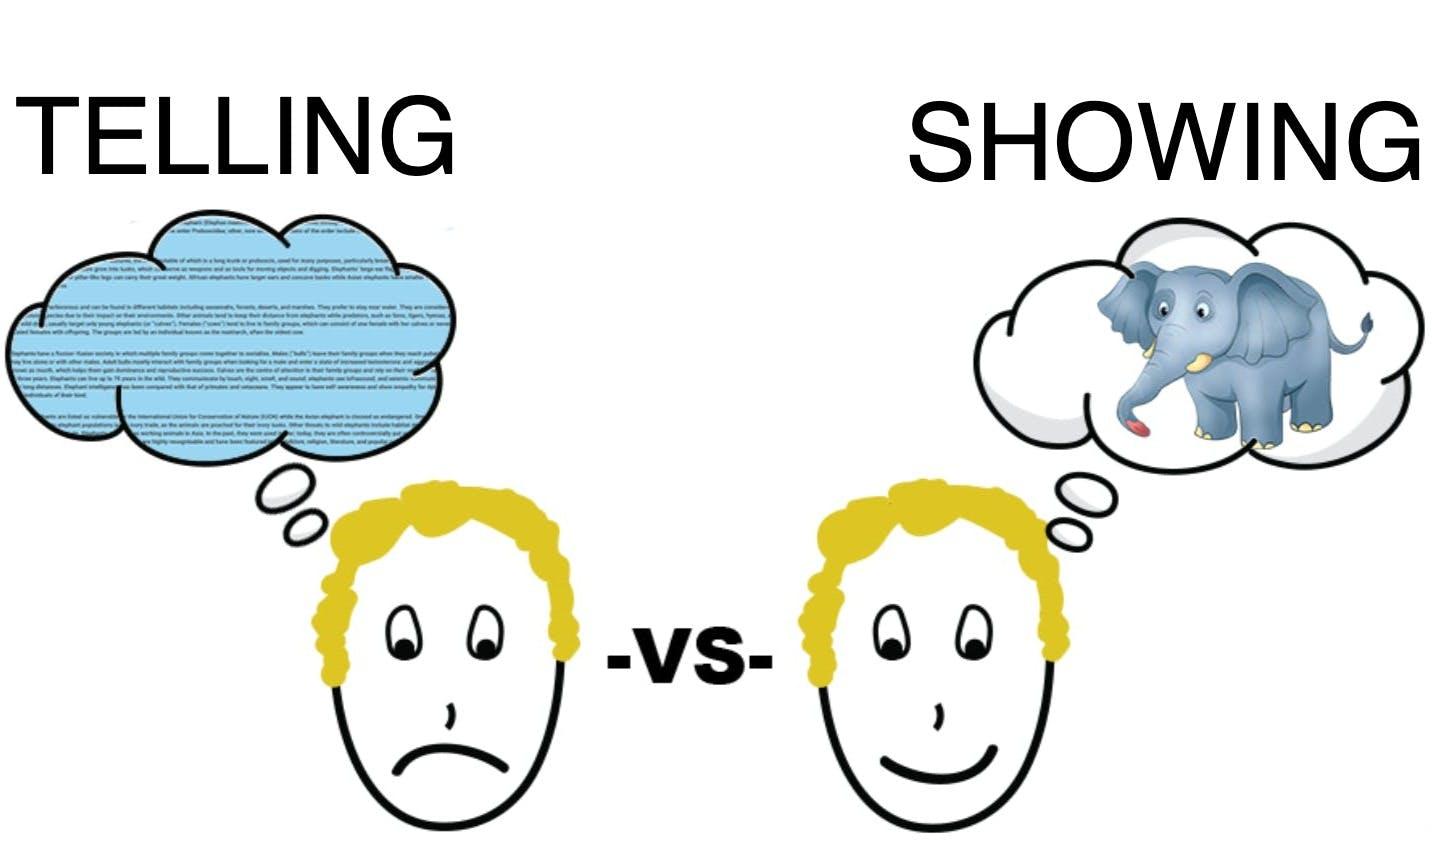 telling vs showing